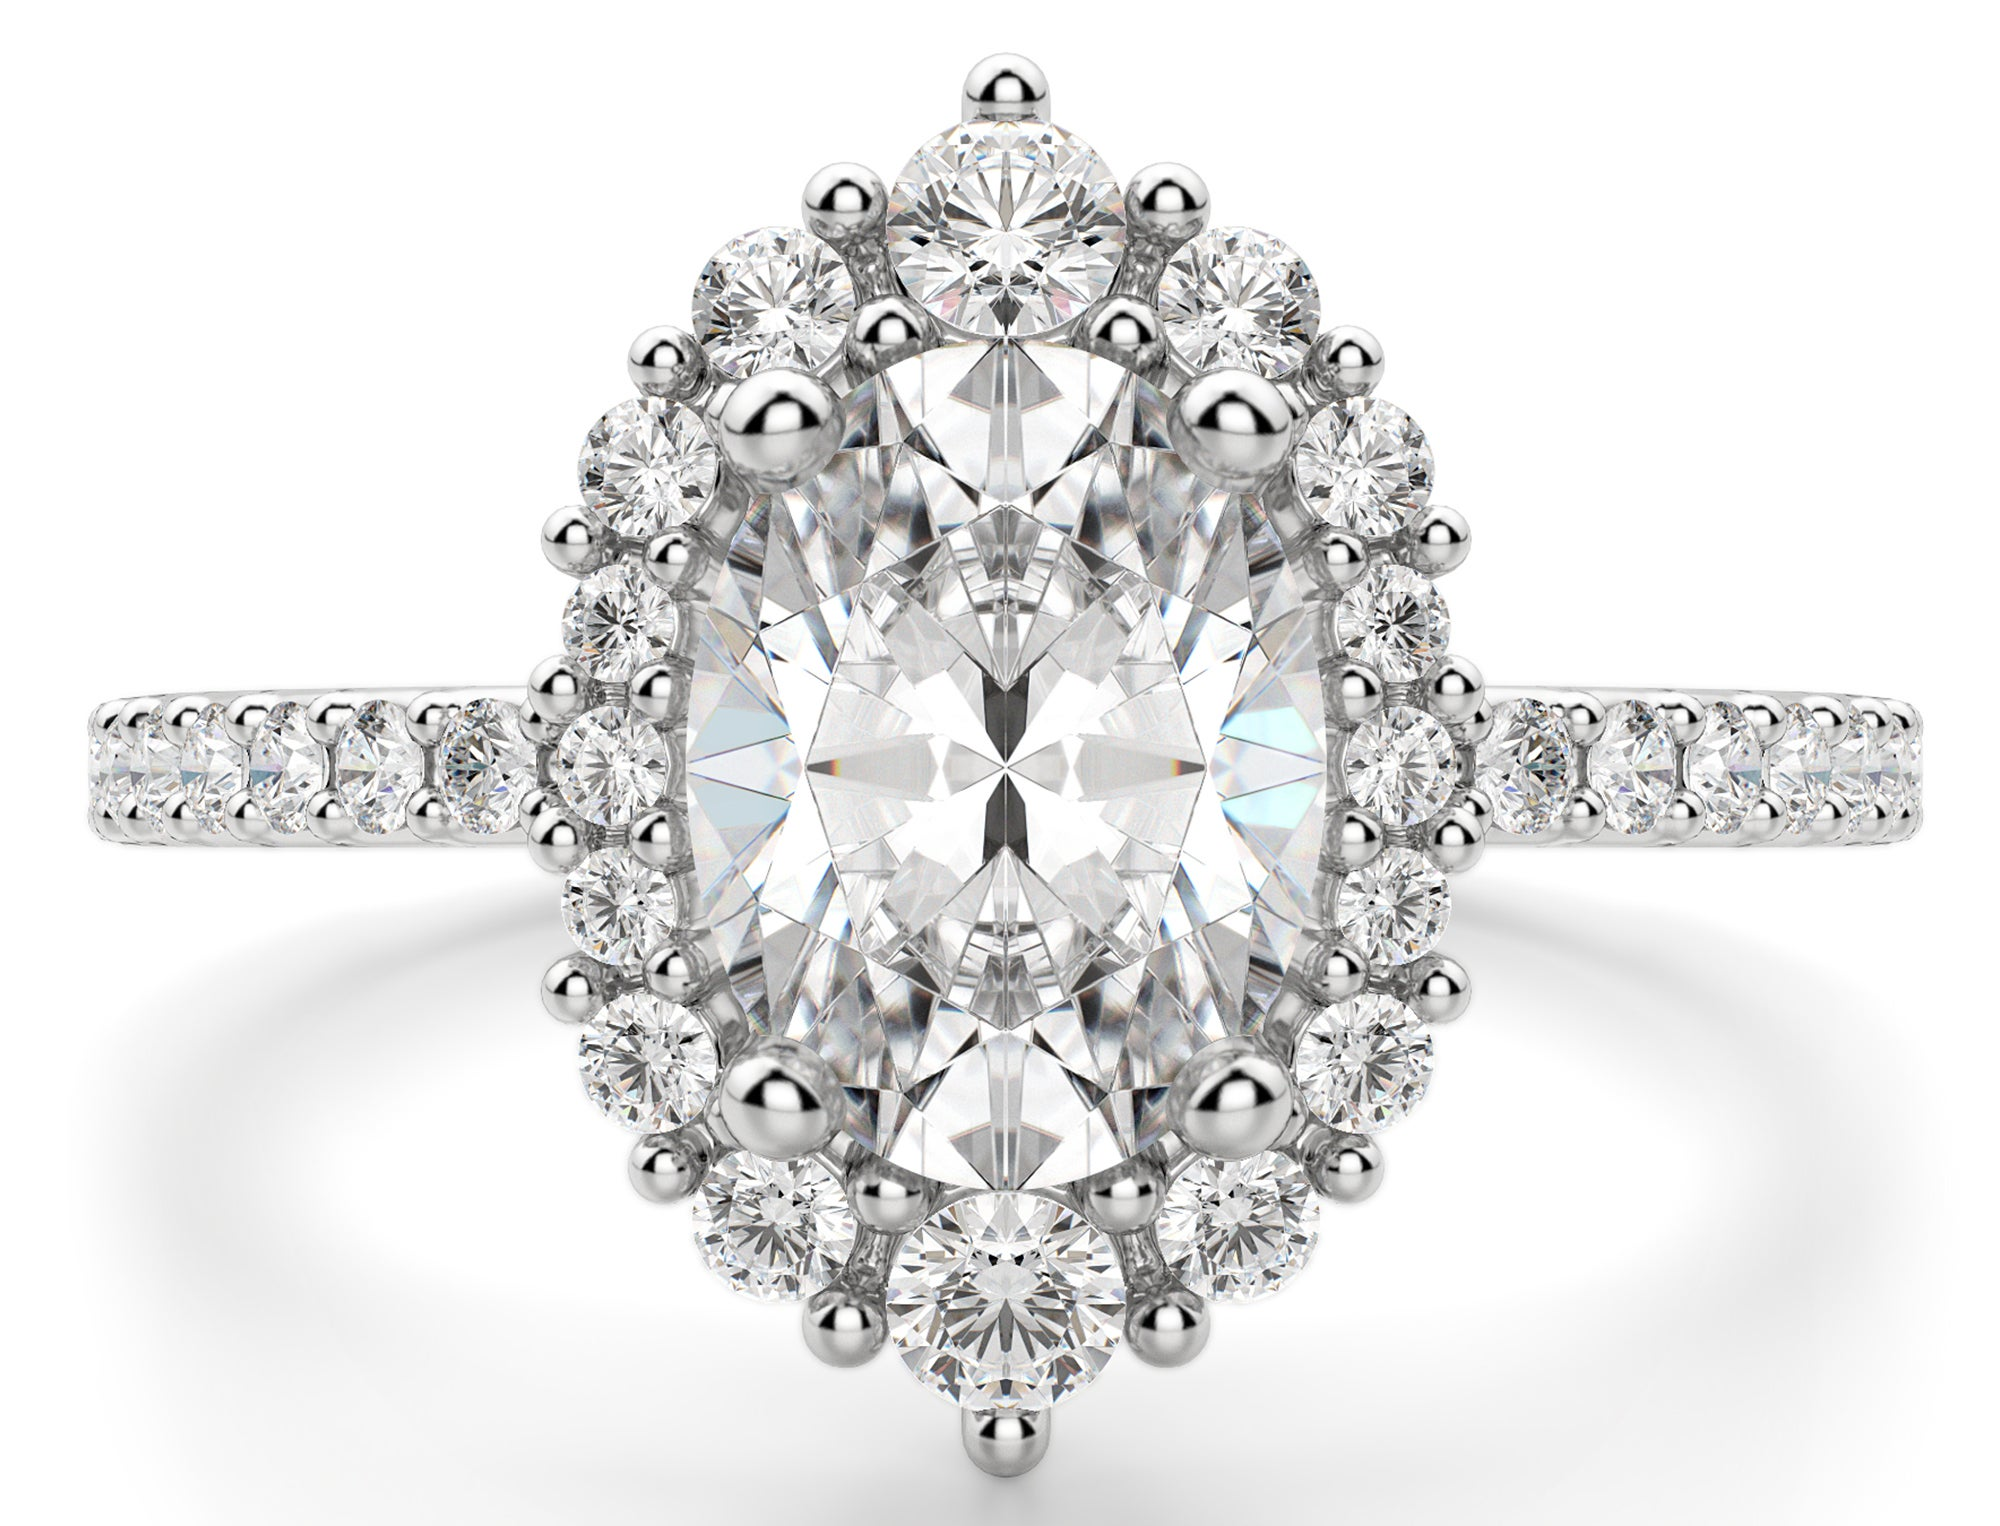 Diamond Nexus Barcelona Oval Cut Engagement Ring